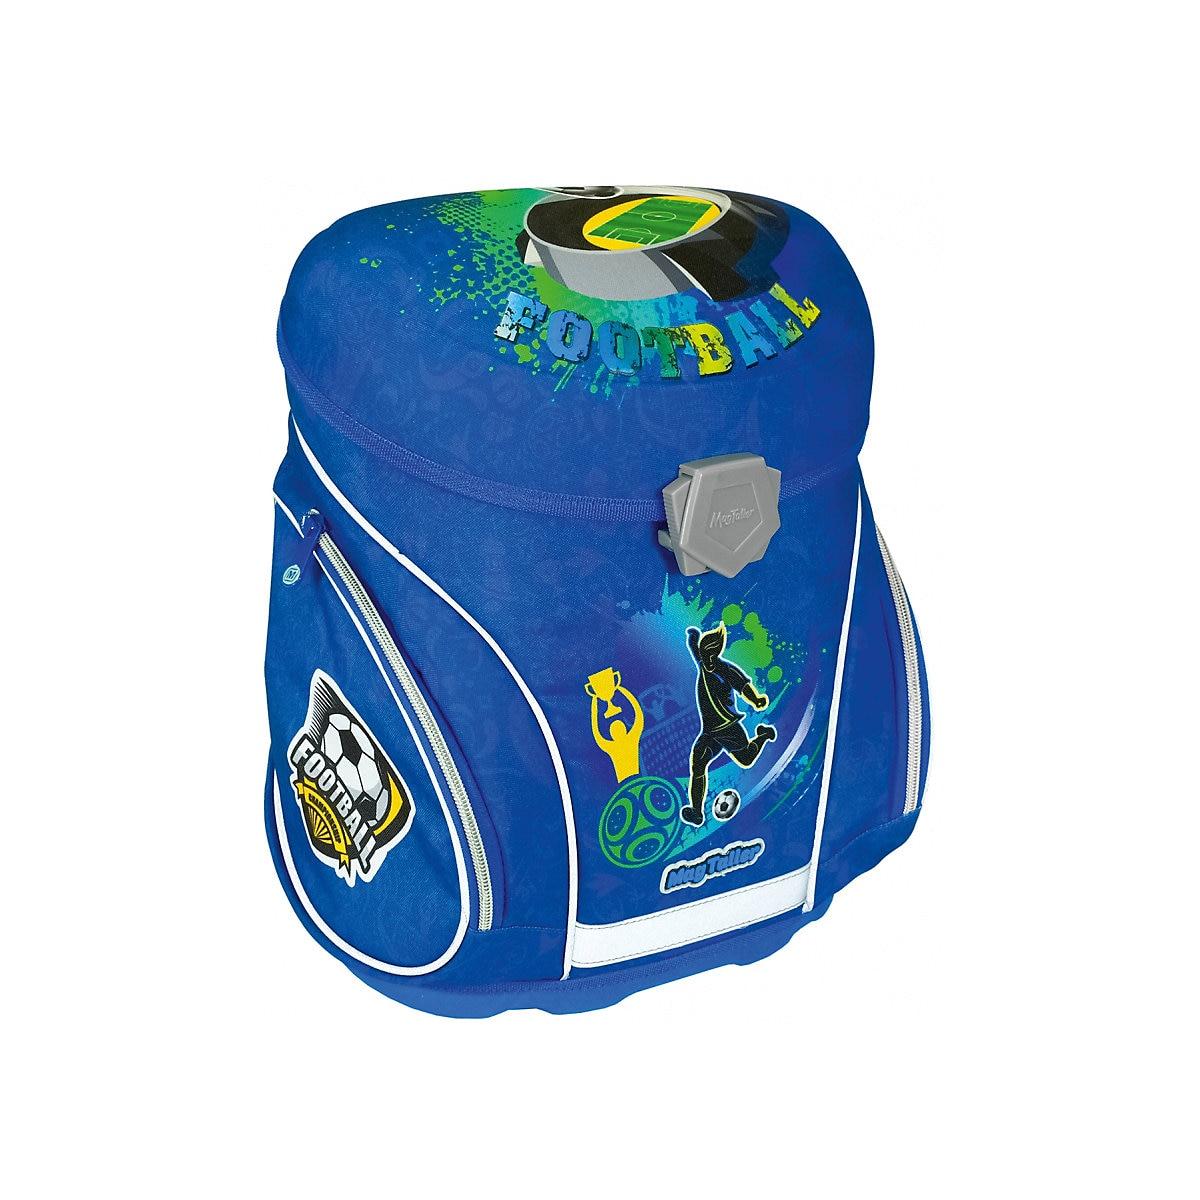 School Bags MAGTALLER 8316020 schoolbag backpack orthopedic bag for boy and girl animals flowers ozuko multi functional men backpack waterproof usb charge computer backpacks 15inch laptop bag creative student school bags 2018